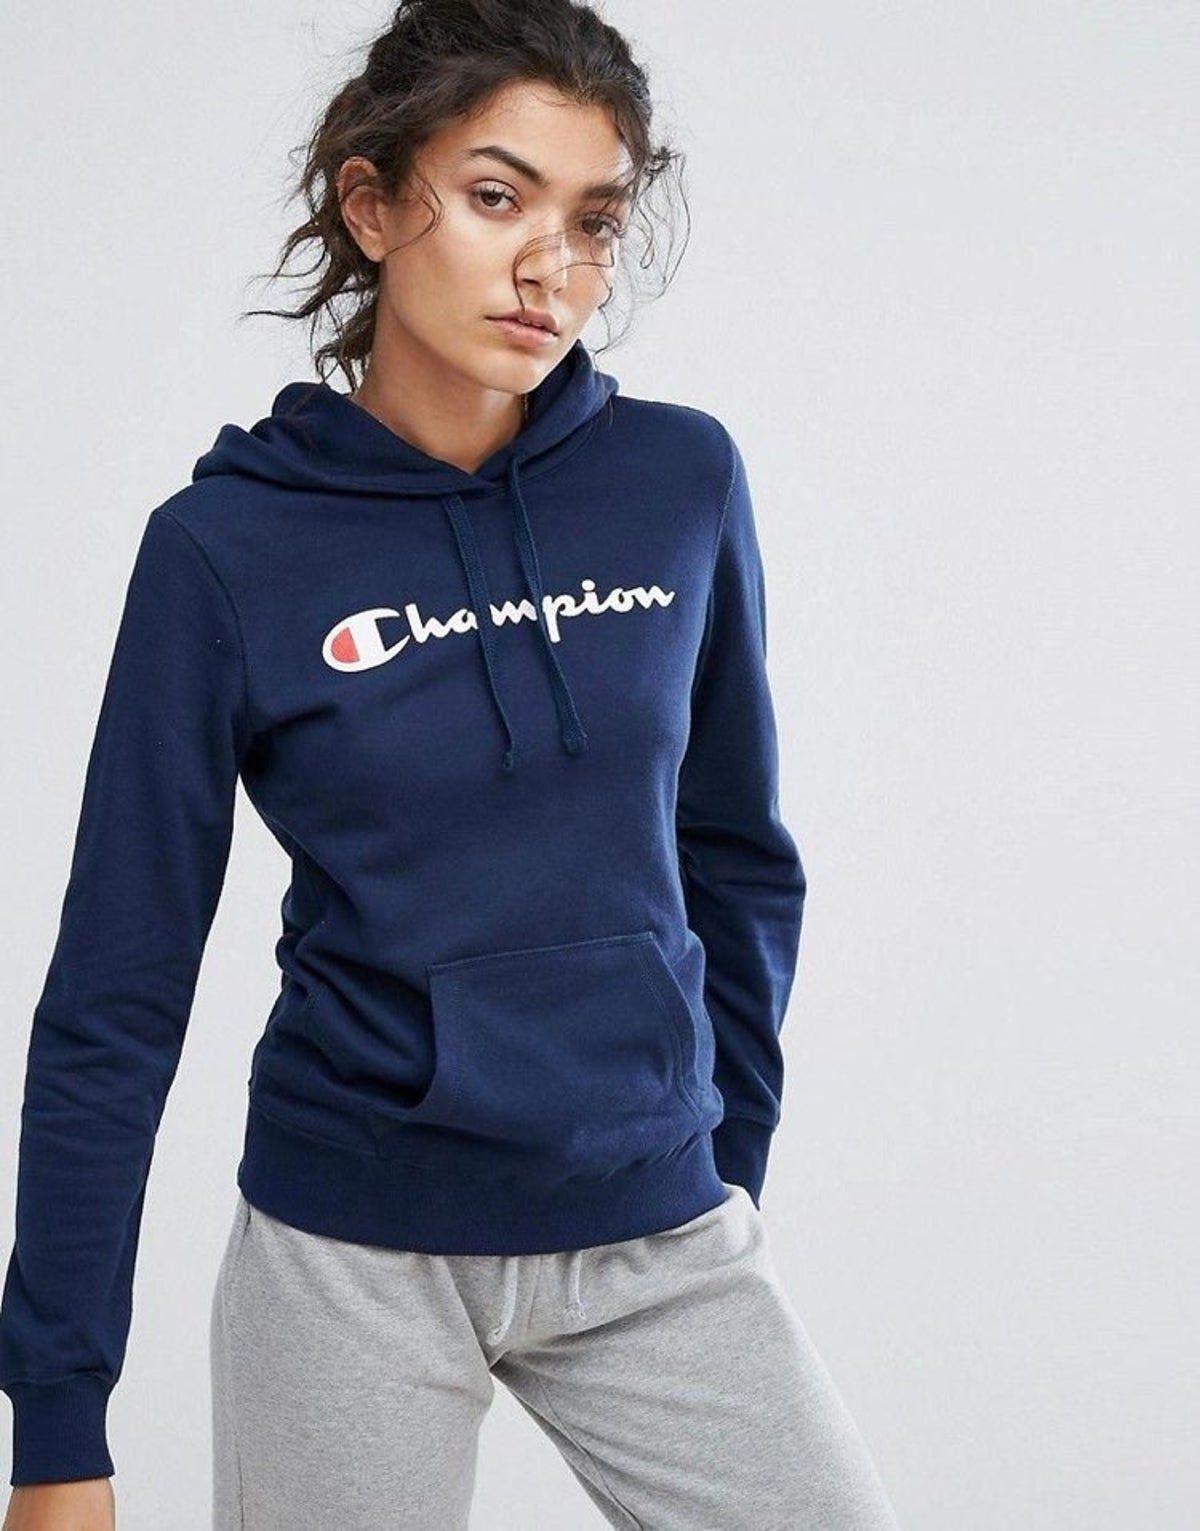 Navy Champion Sweatshirt Champion Hoodie Women Champion Clothing Blue Sweatshirt Outfit [ 1531 x 1200 Pixel ]